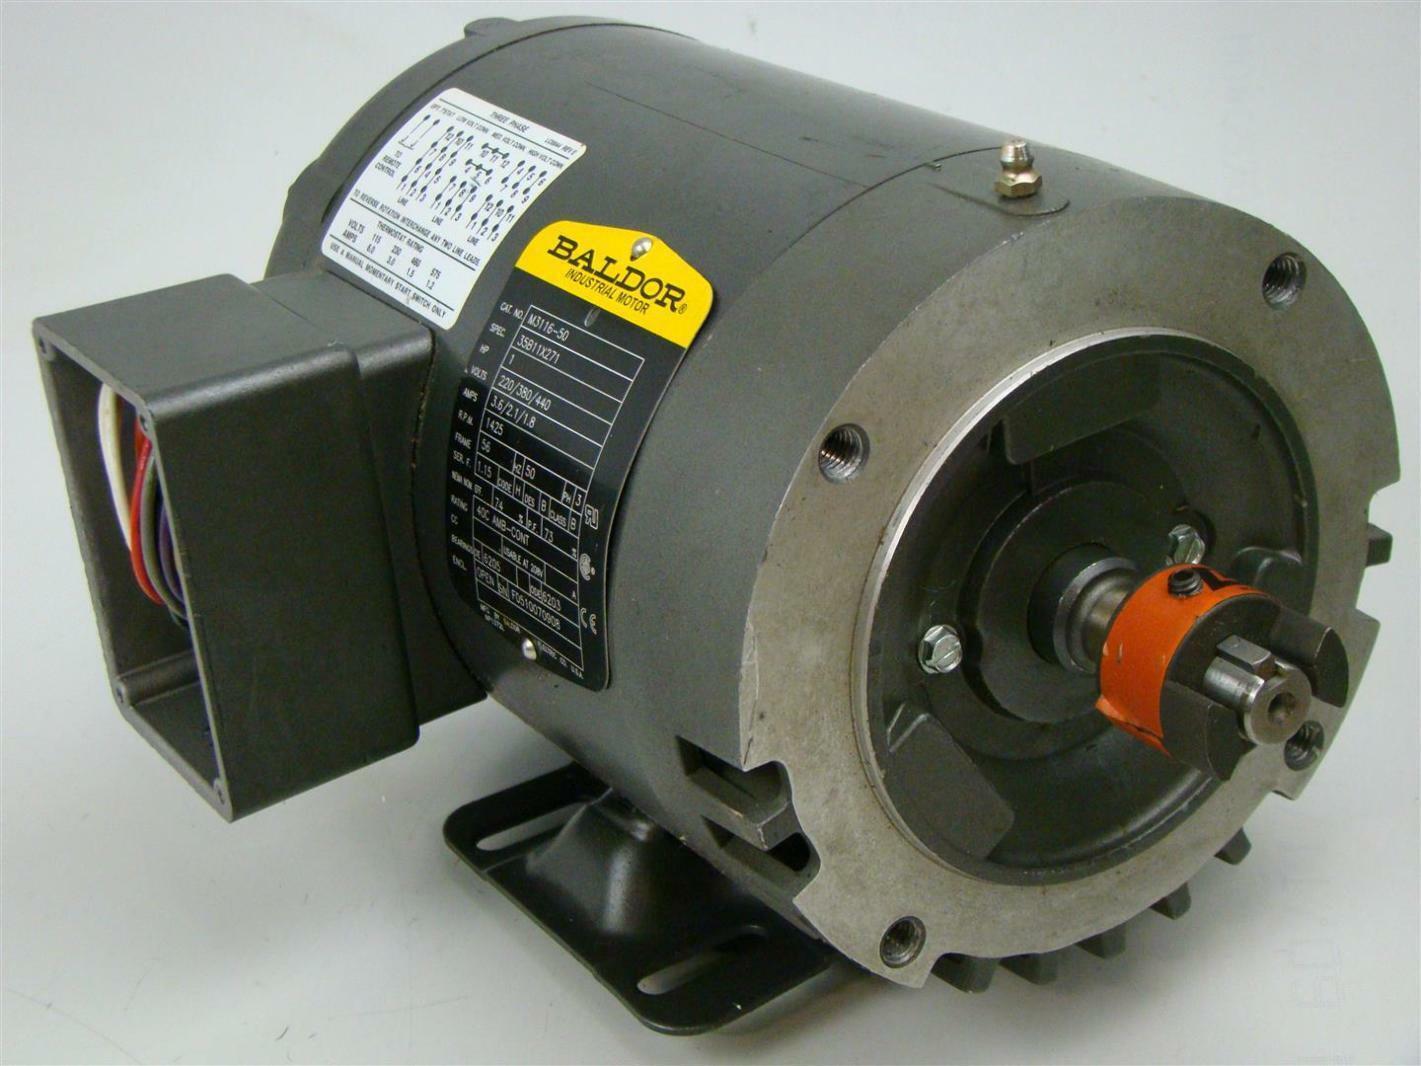 Baldor 1hp industrial motor 220 380 440v 1425rpm m3116 50 Baldor industrial motor pump